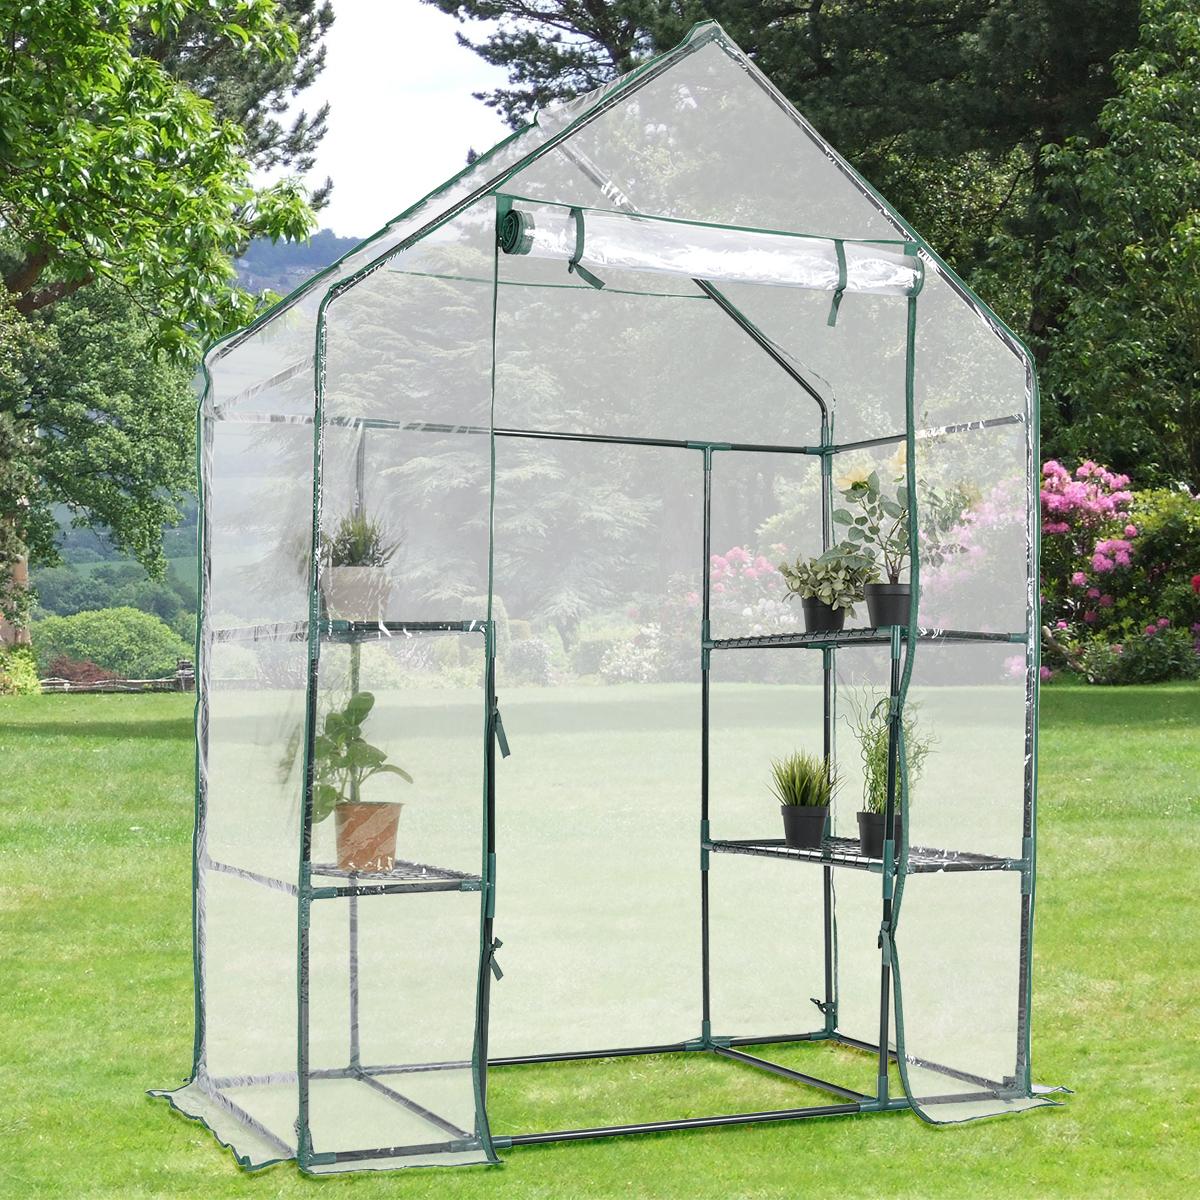 Costway Portable Mini Walk In Outdoor 3 Tier 6 Shelves Greenhouse